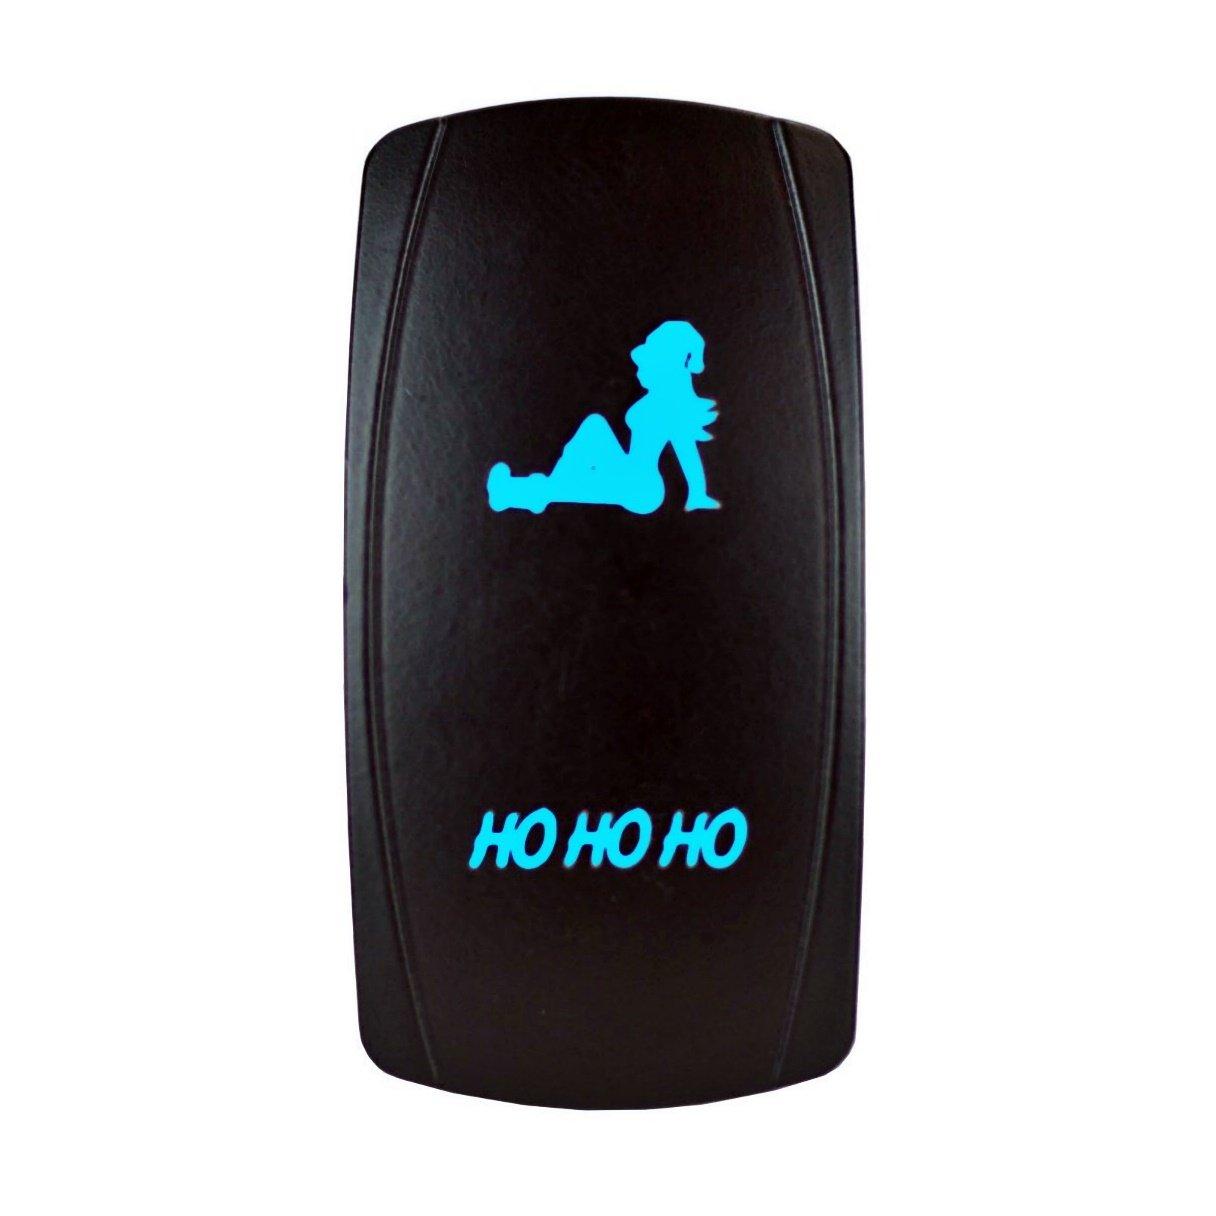 STV Motorsports Blue Rocker Switch HO HO HO 20A 12V On-Off LED Light Laser Etched Waterproof Universal